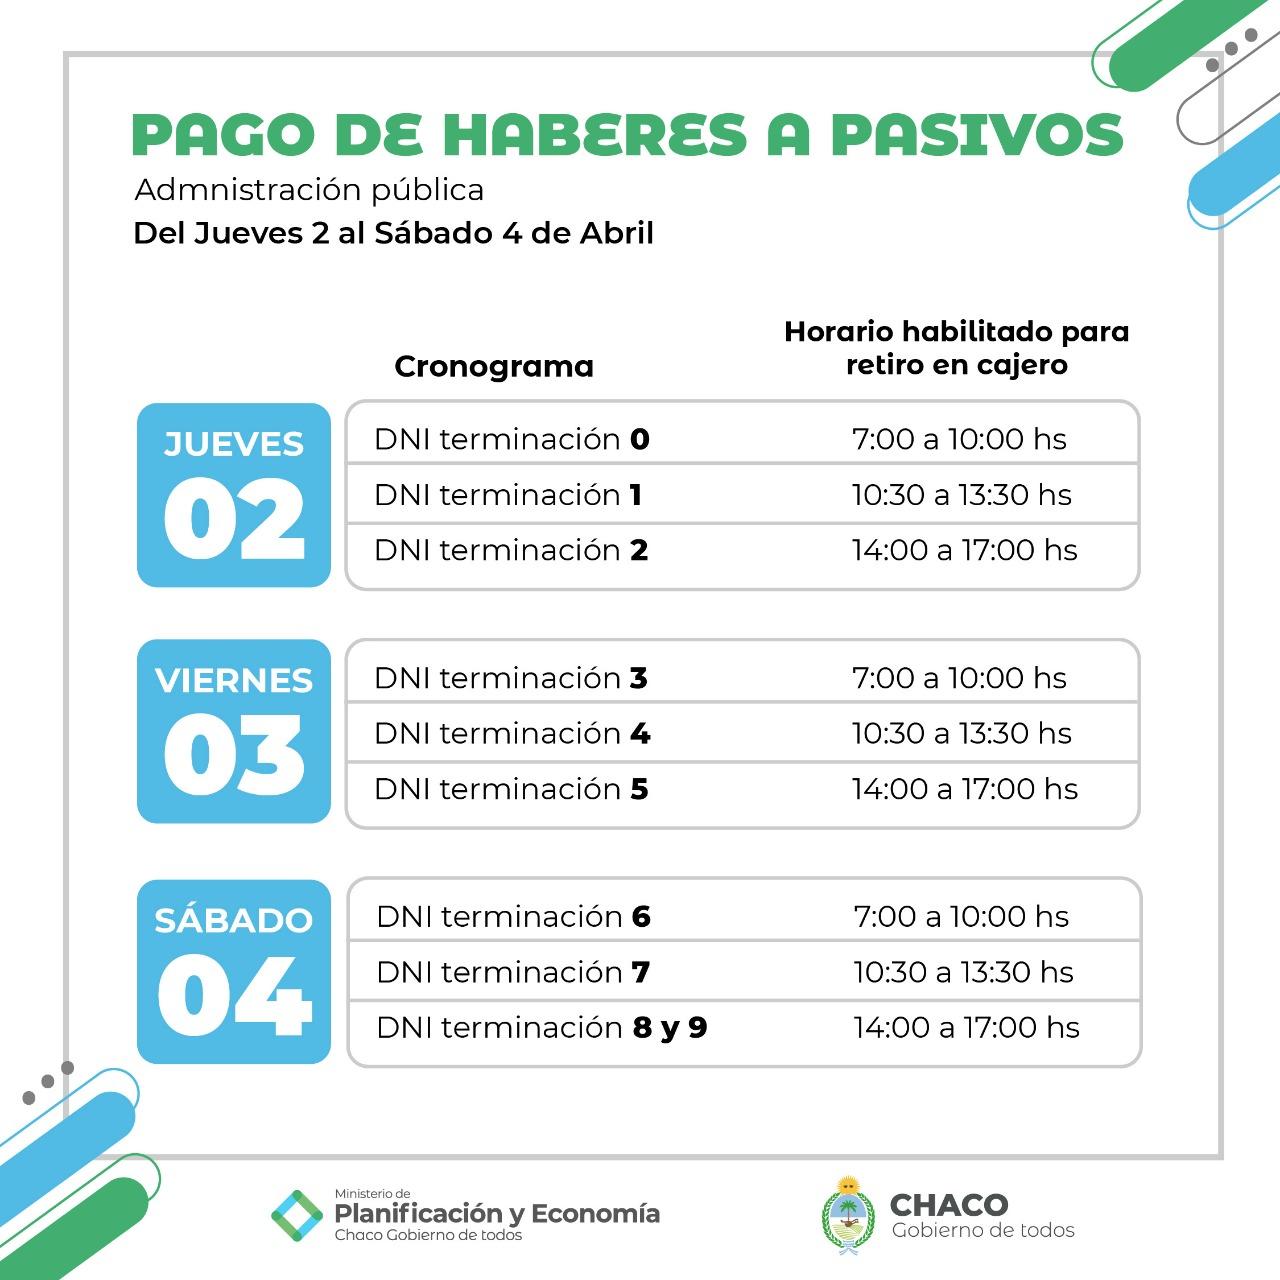 Jorge-Capitanich-Informe-epidemiologico-20-03-30-103